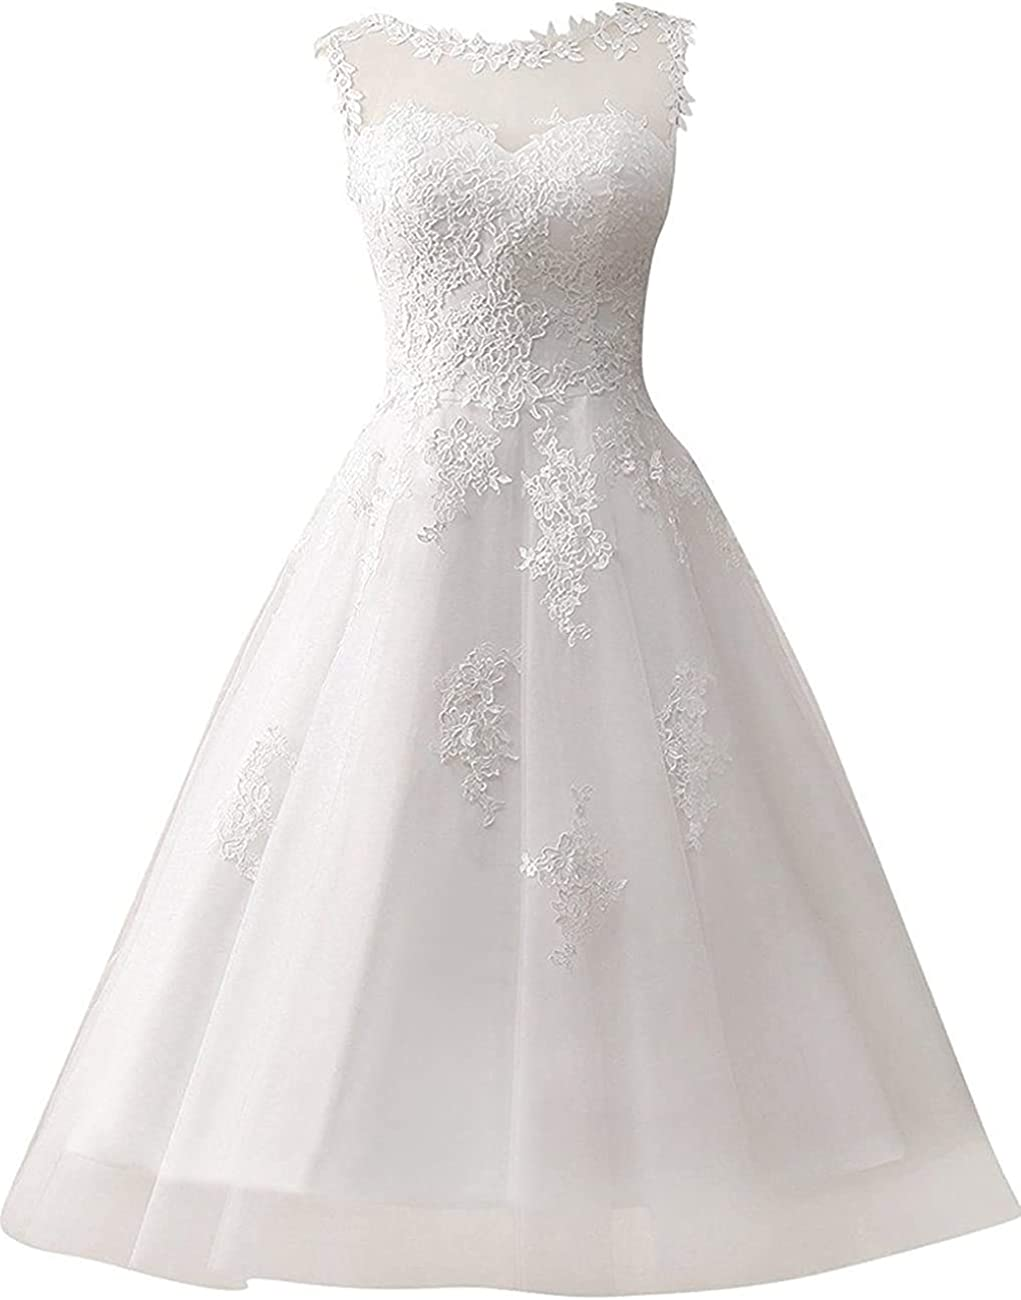 Melisa Women's A line Lace Beach Wedding Dresses for Bride with Short Length Bridal Gown Plus Size